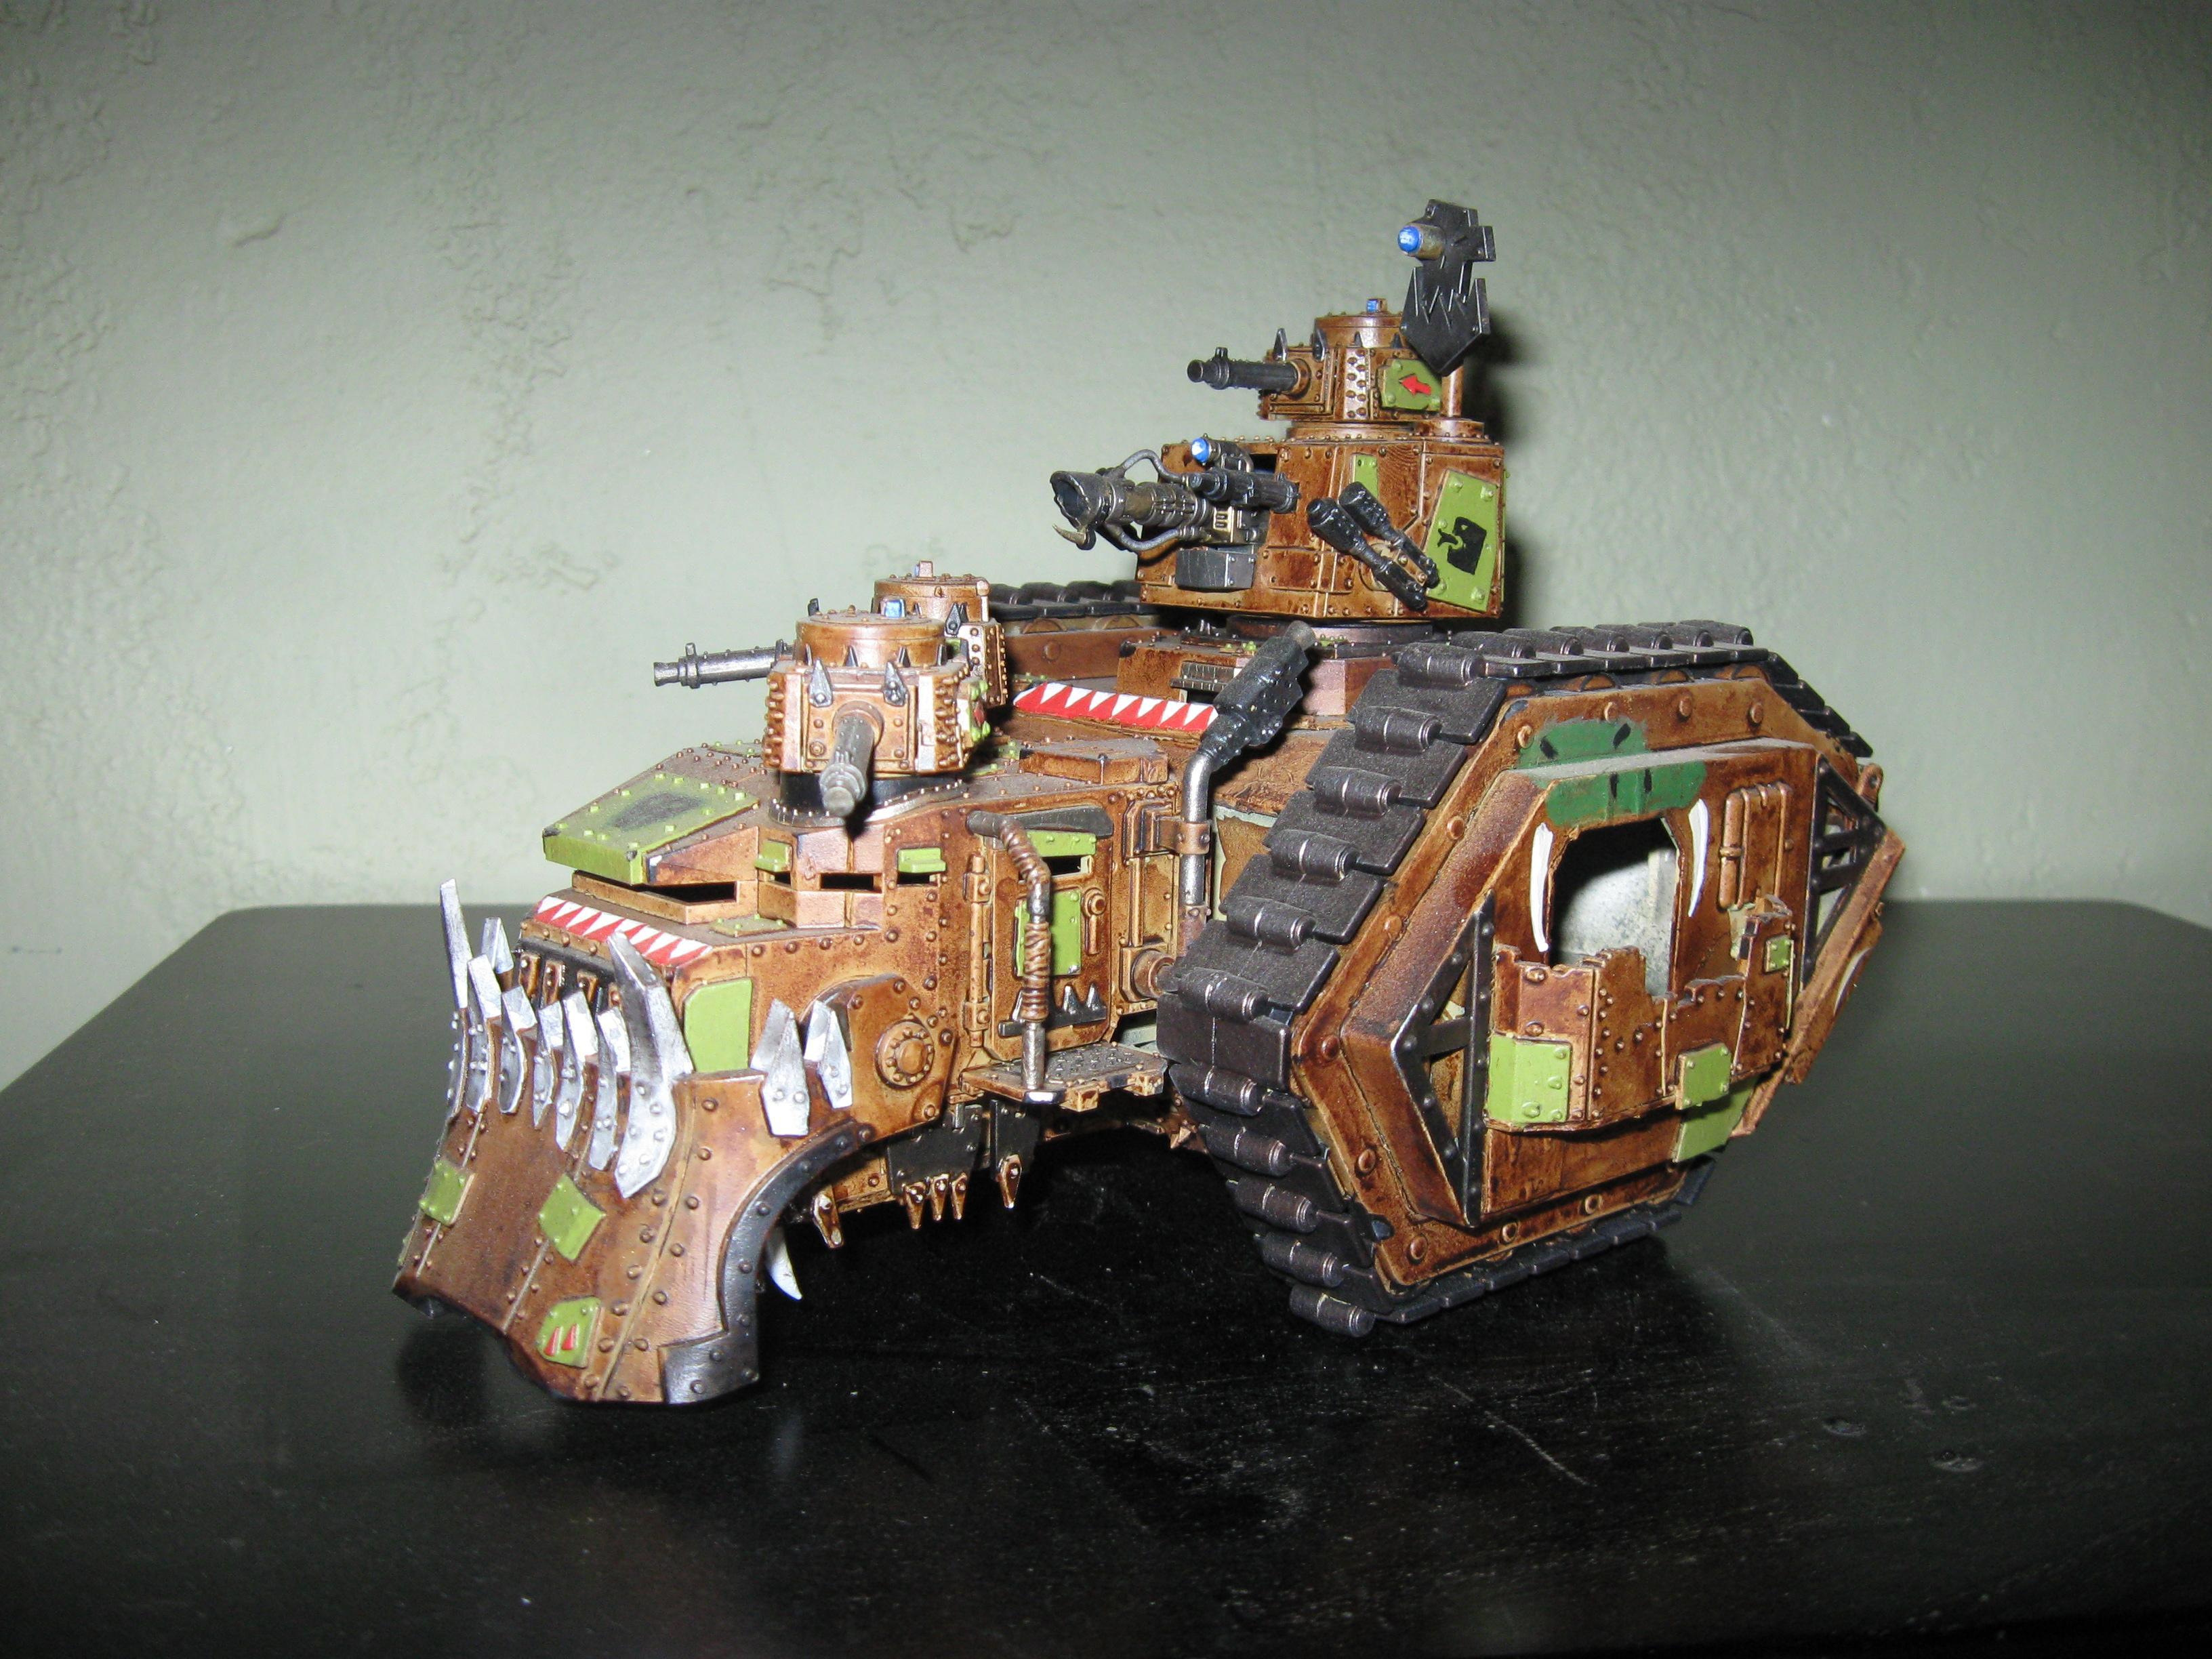 Battlewagon, Conversion, Orks, Warhammer 40,000